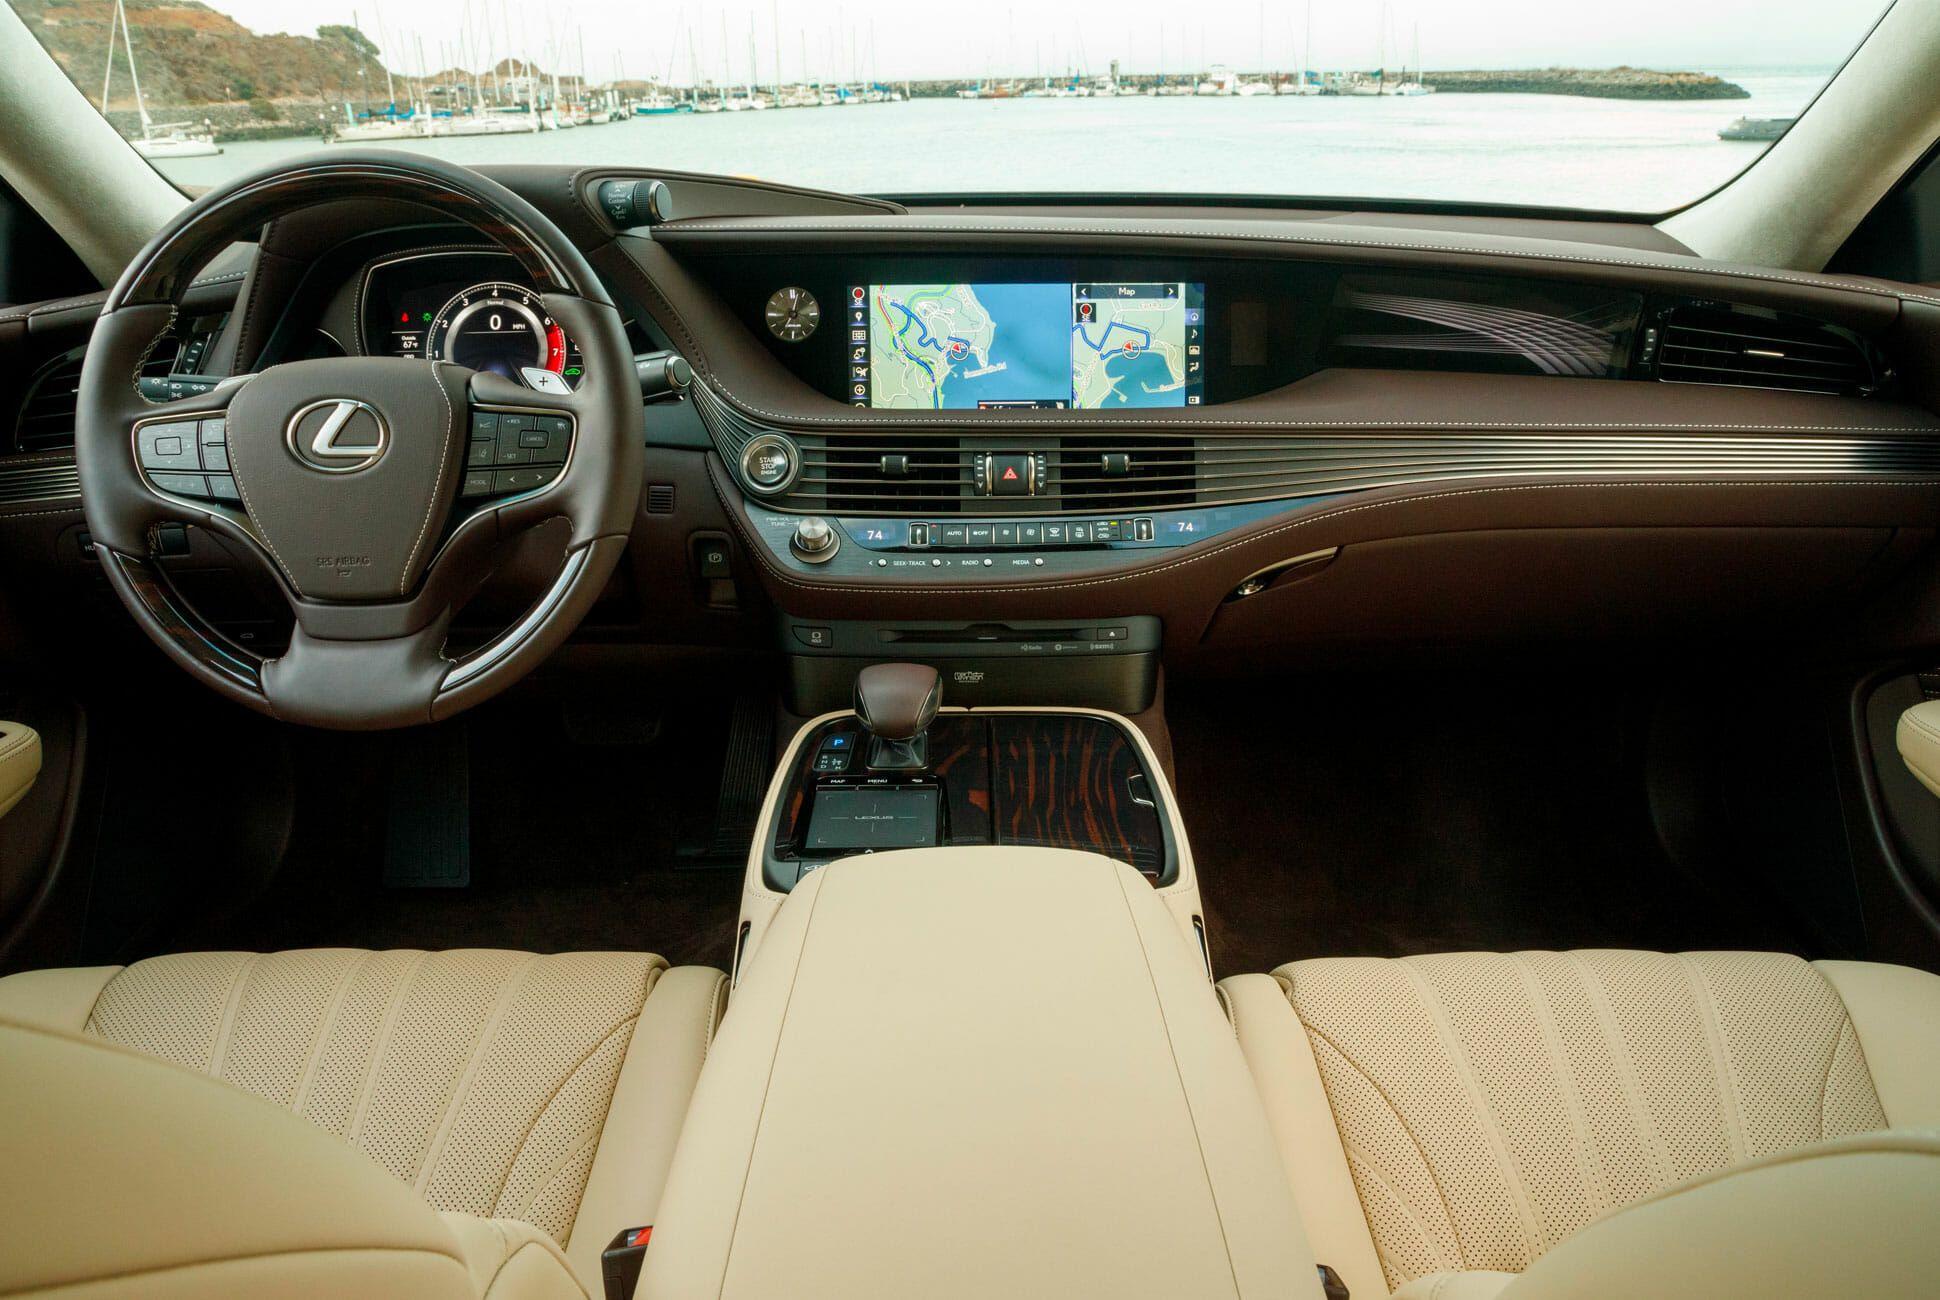 Lexus-LS-500-AWD-Review-gear-patrol-slide-5